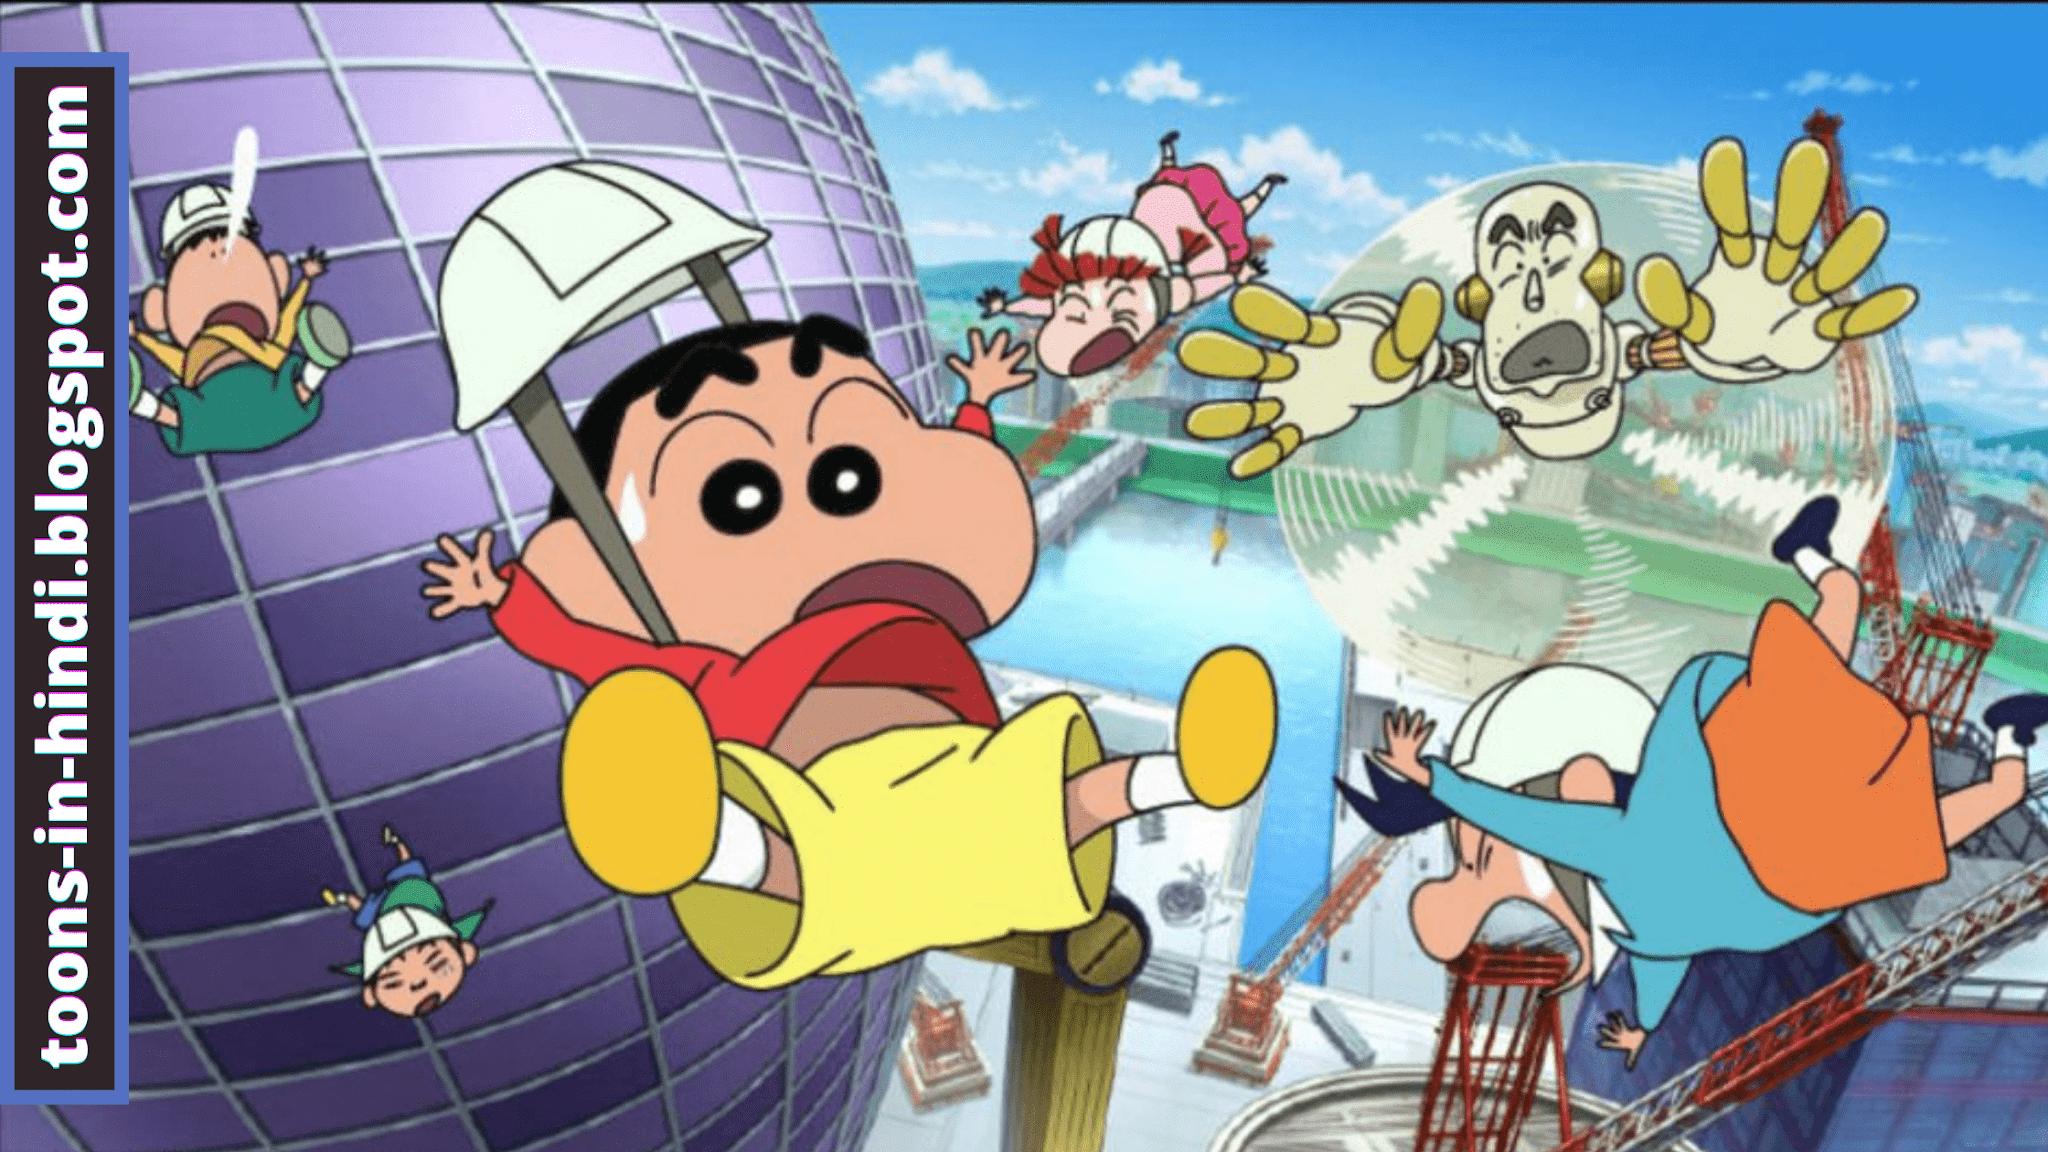 shin chan movie robot dad in hindi free download doremon cartoon movies dubbed